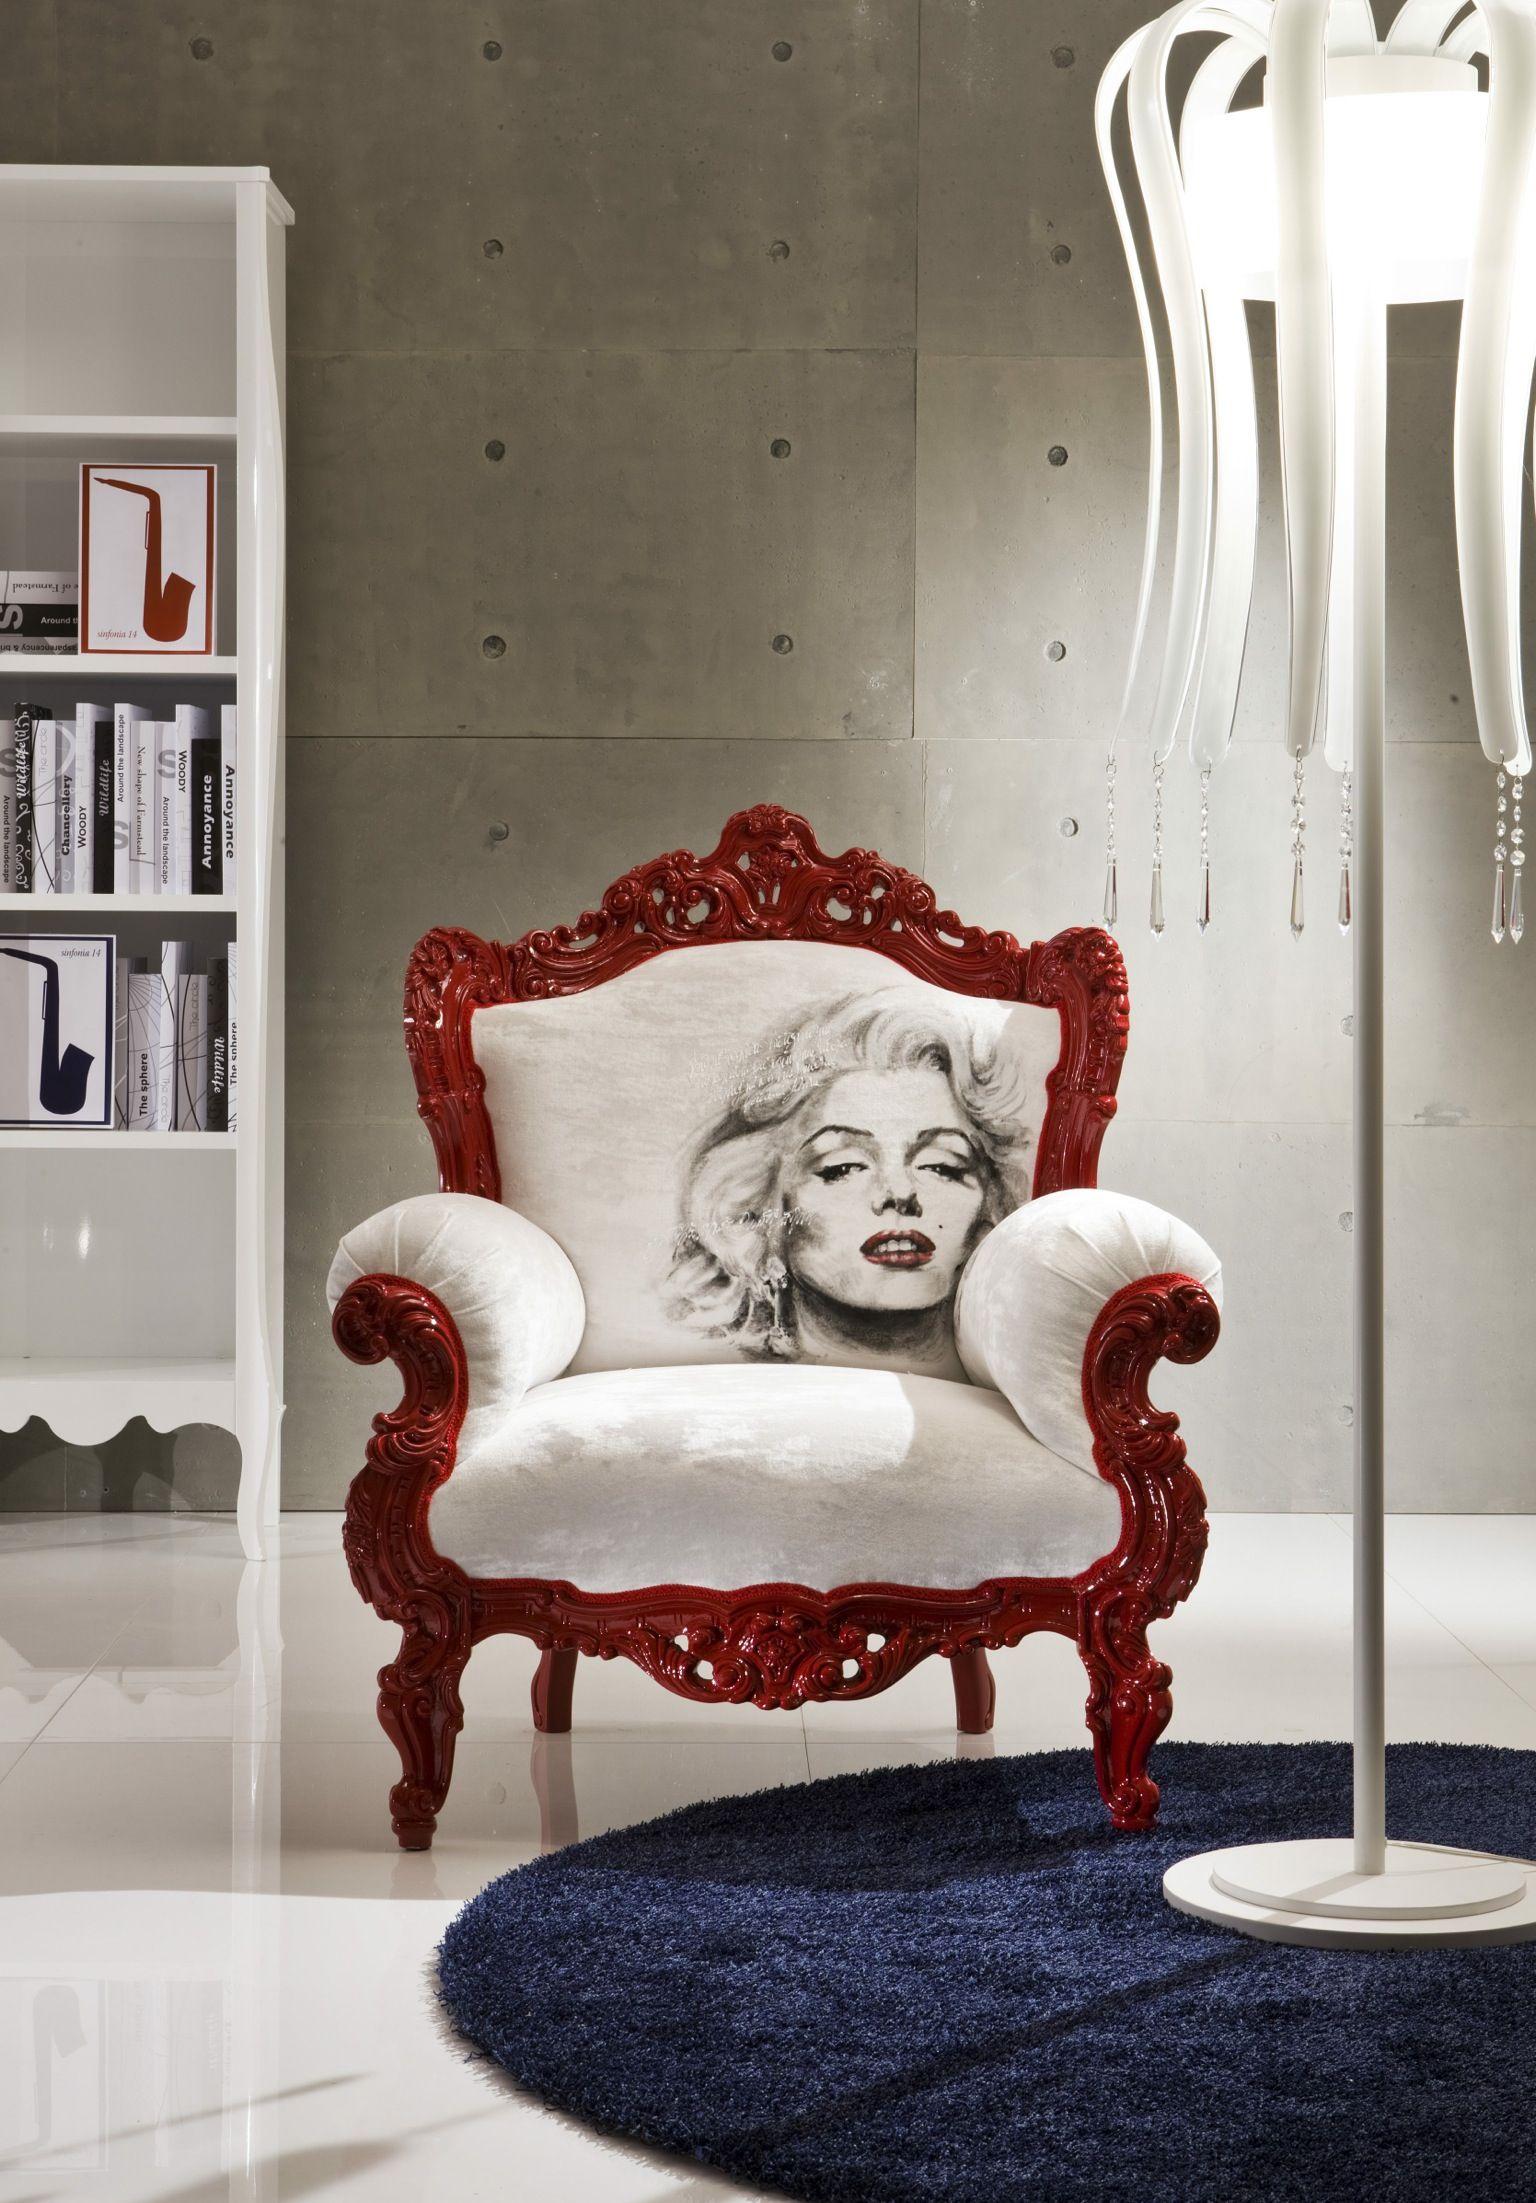 Marilyn Decorated Furniture Marilyn Monroe Bedroom Decor Home Decor